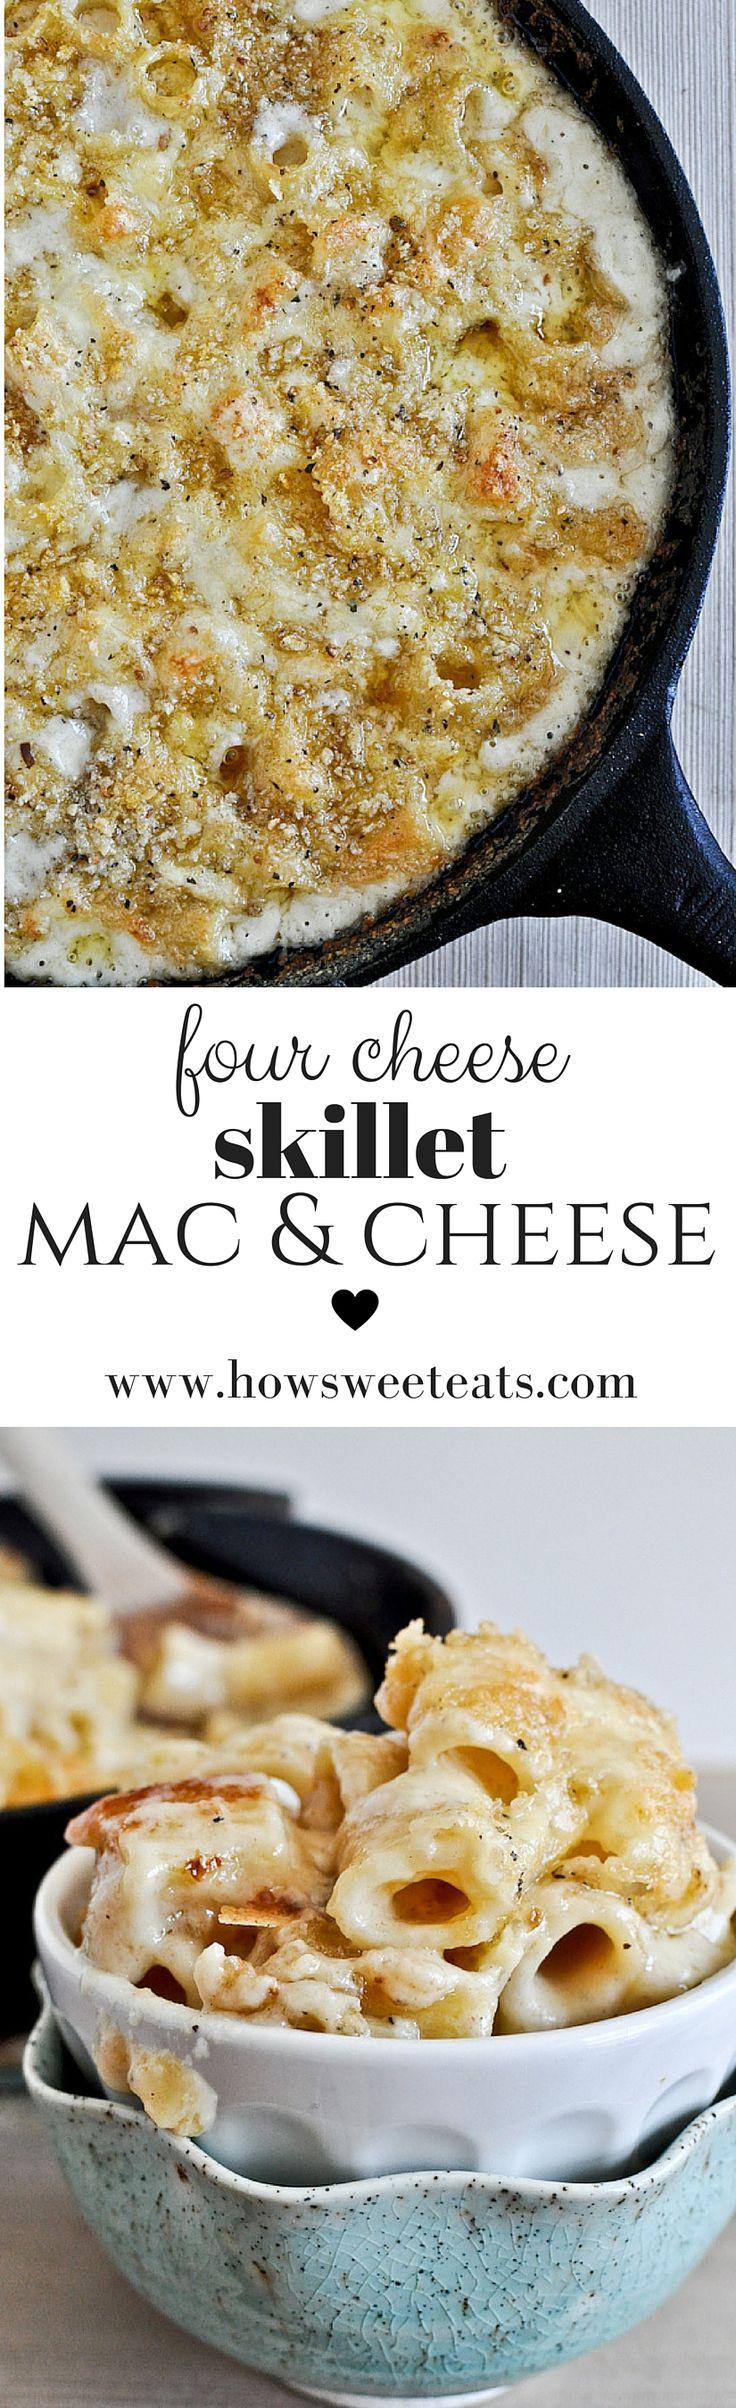 Four Cheese Mac and Cheese! I howsweeteats.com @howsweeteats